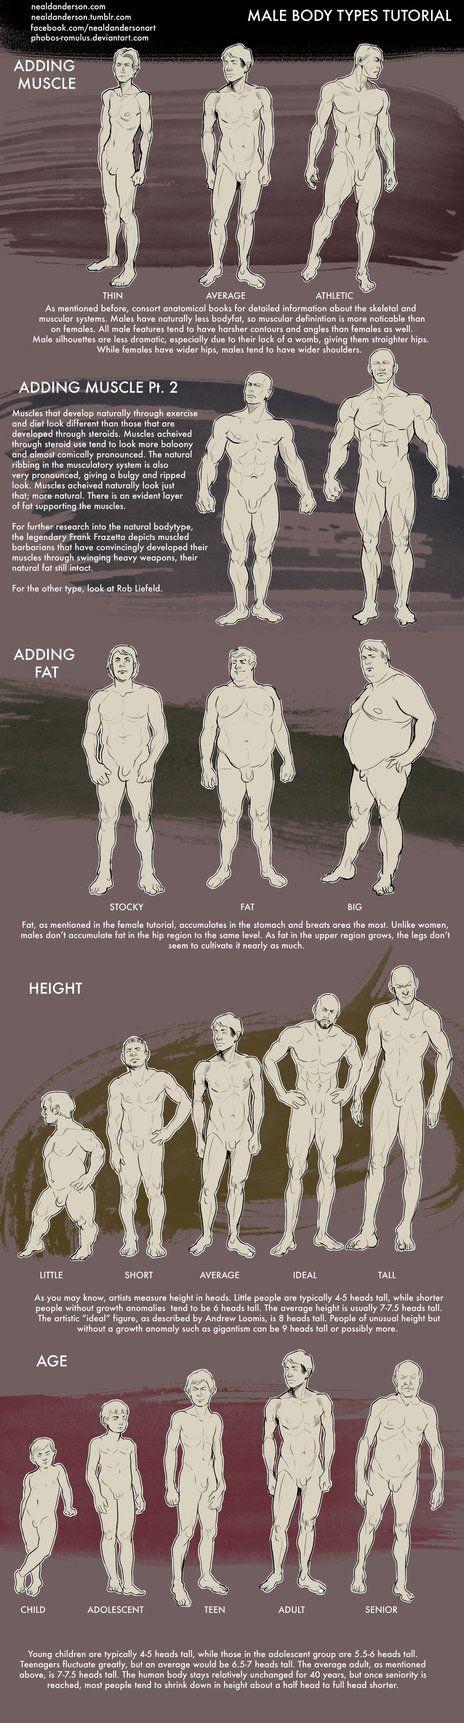 tipos de corpo masculino: